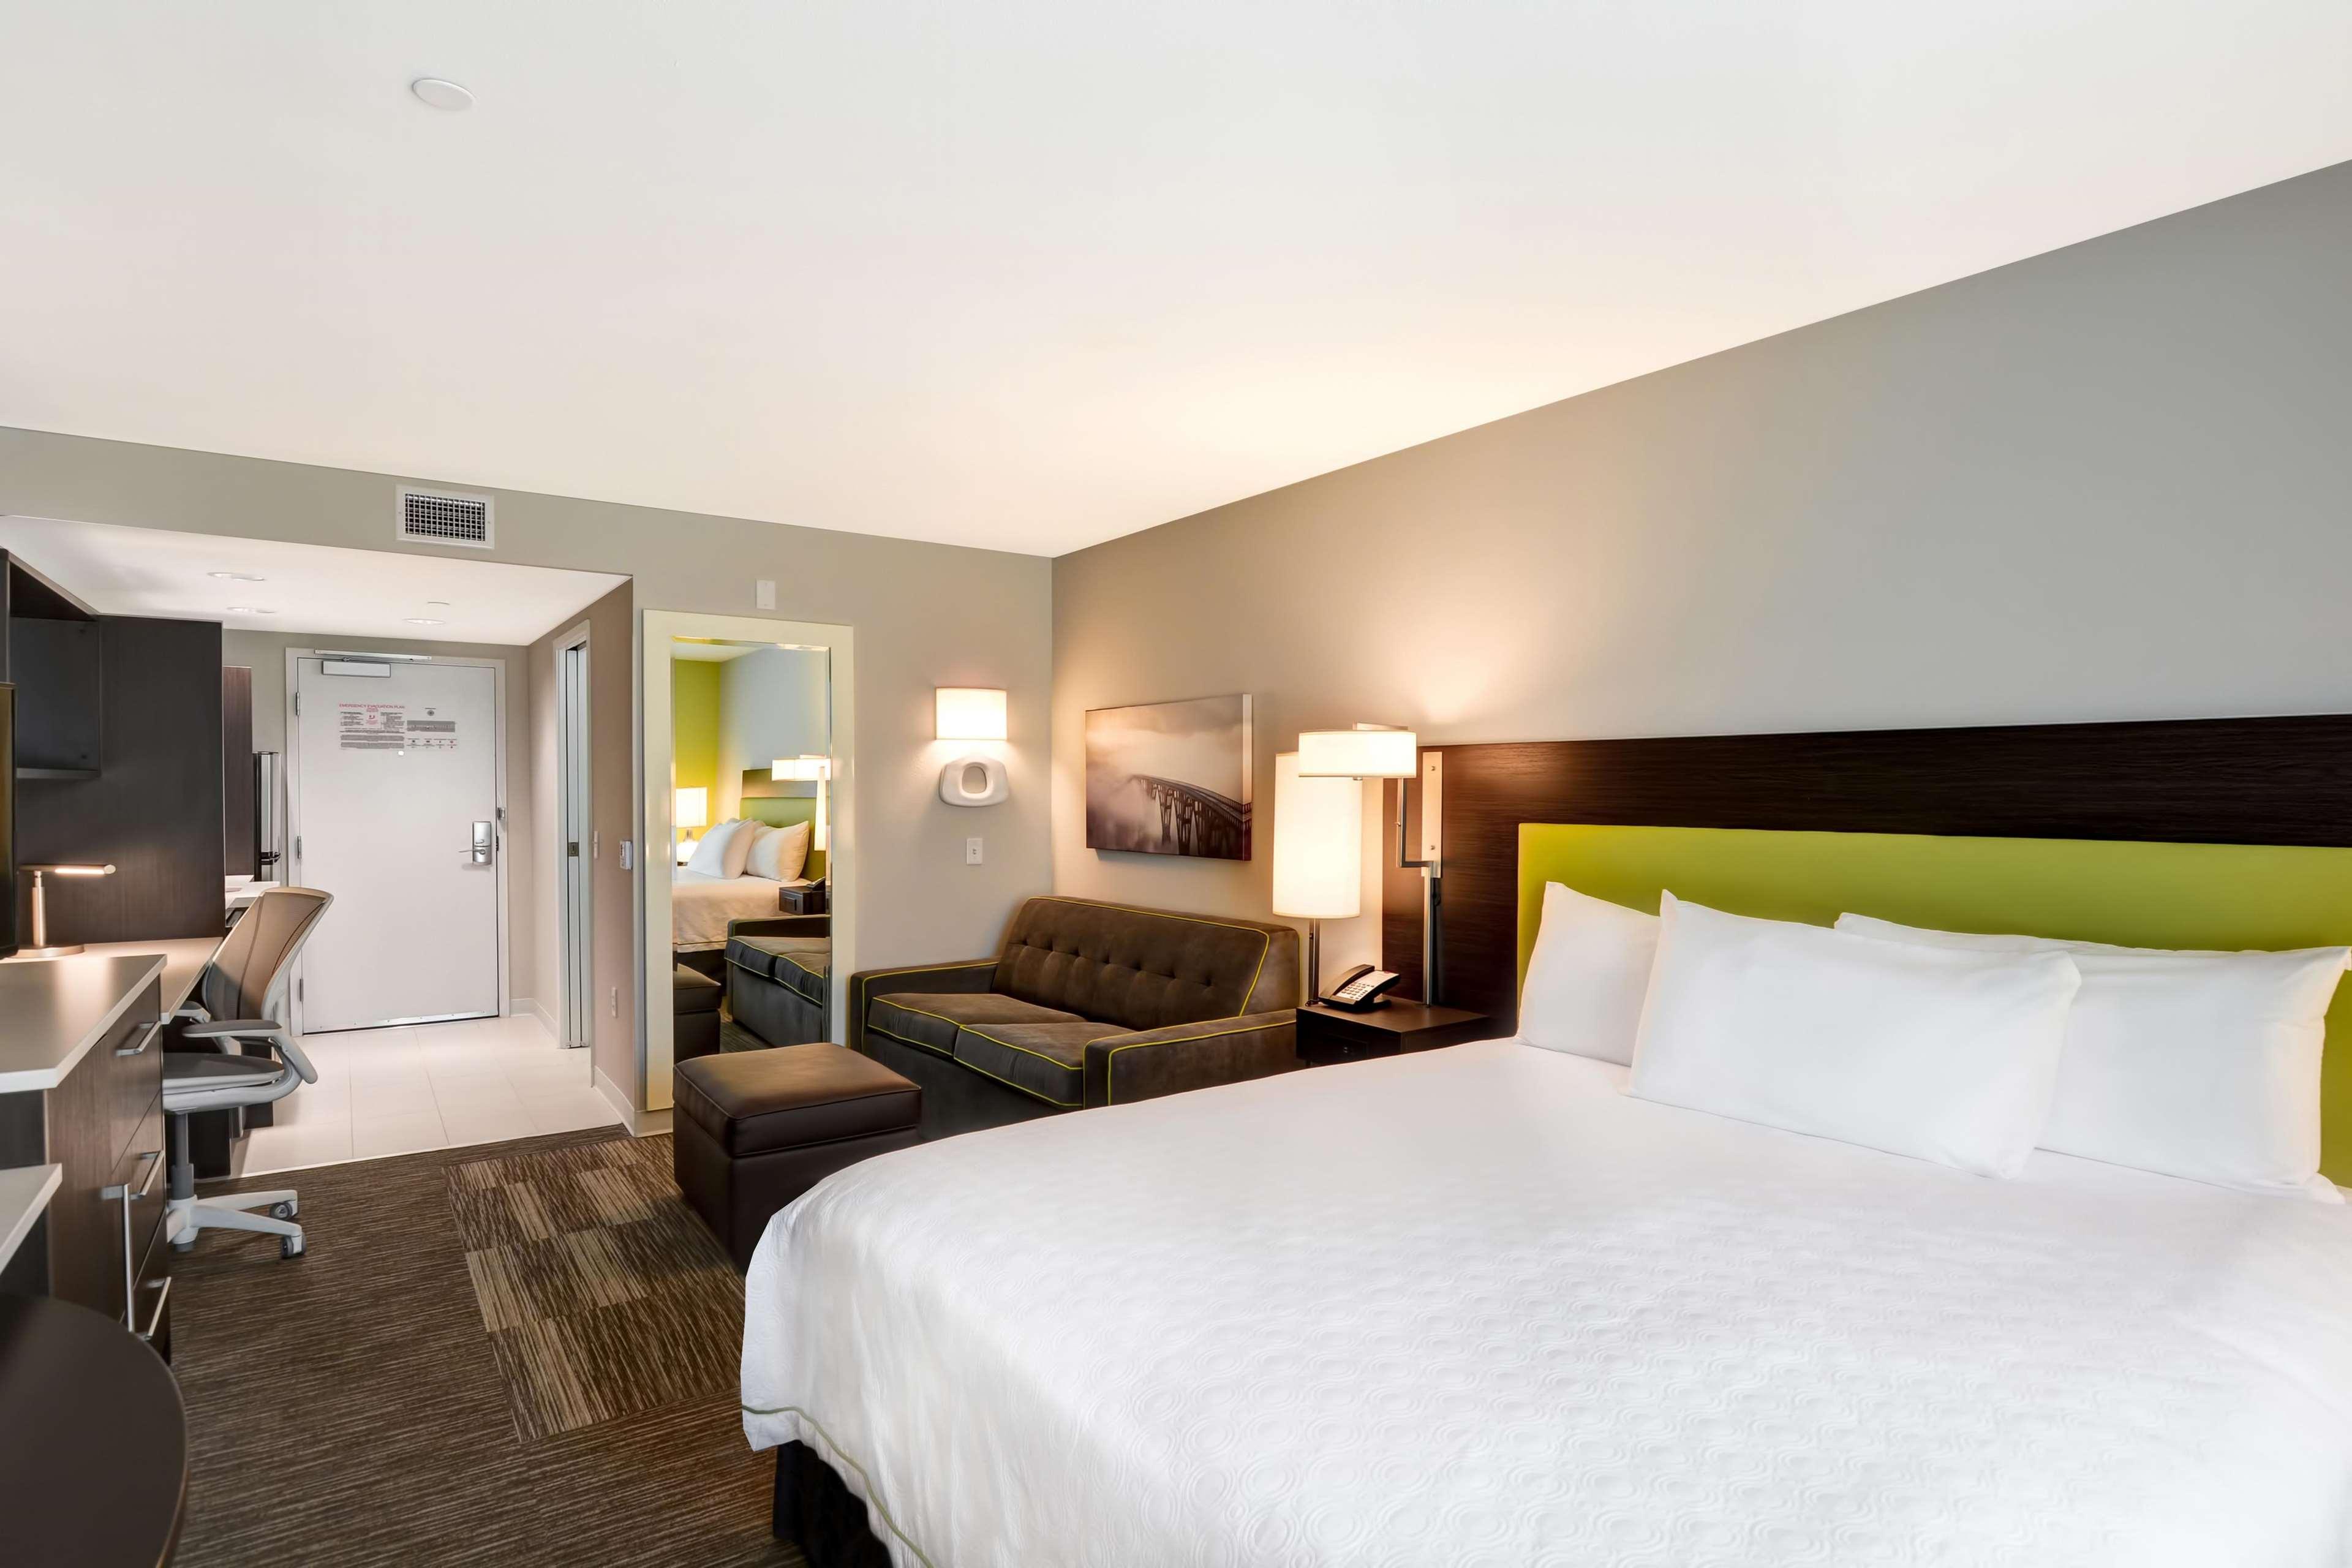 Home2 Suites by Hilton Azusa image 37